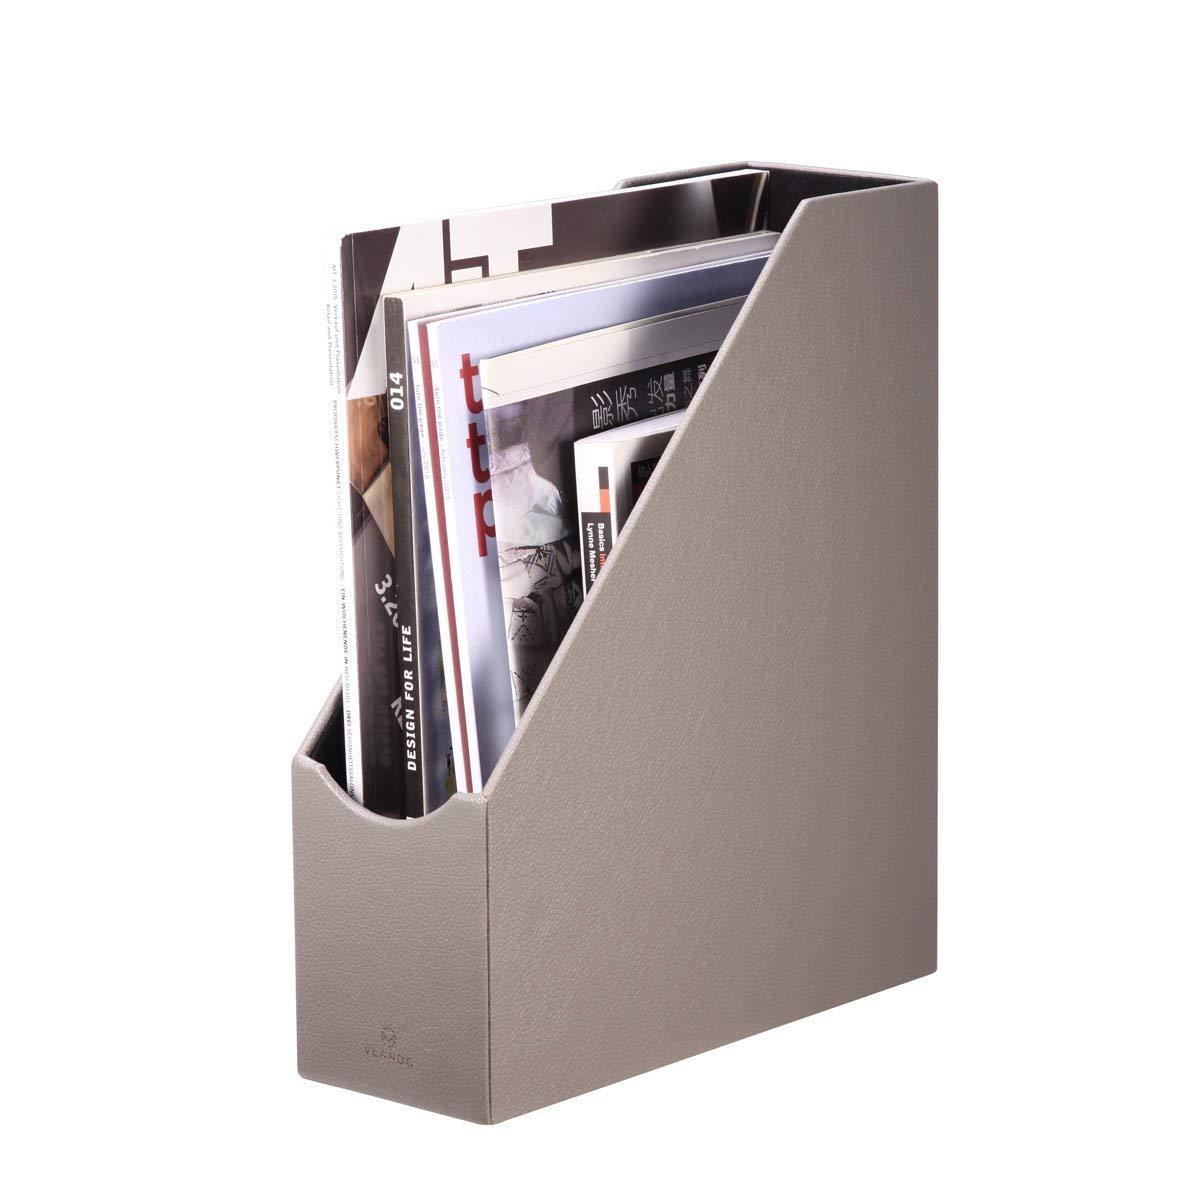 Vlando VPACK Magazine File Organizer Holder - Office PU Leather Desk Organizer Collection, Assorted Color (Pebble Grey)